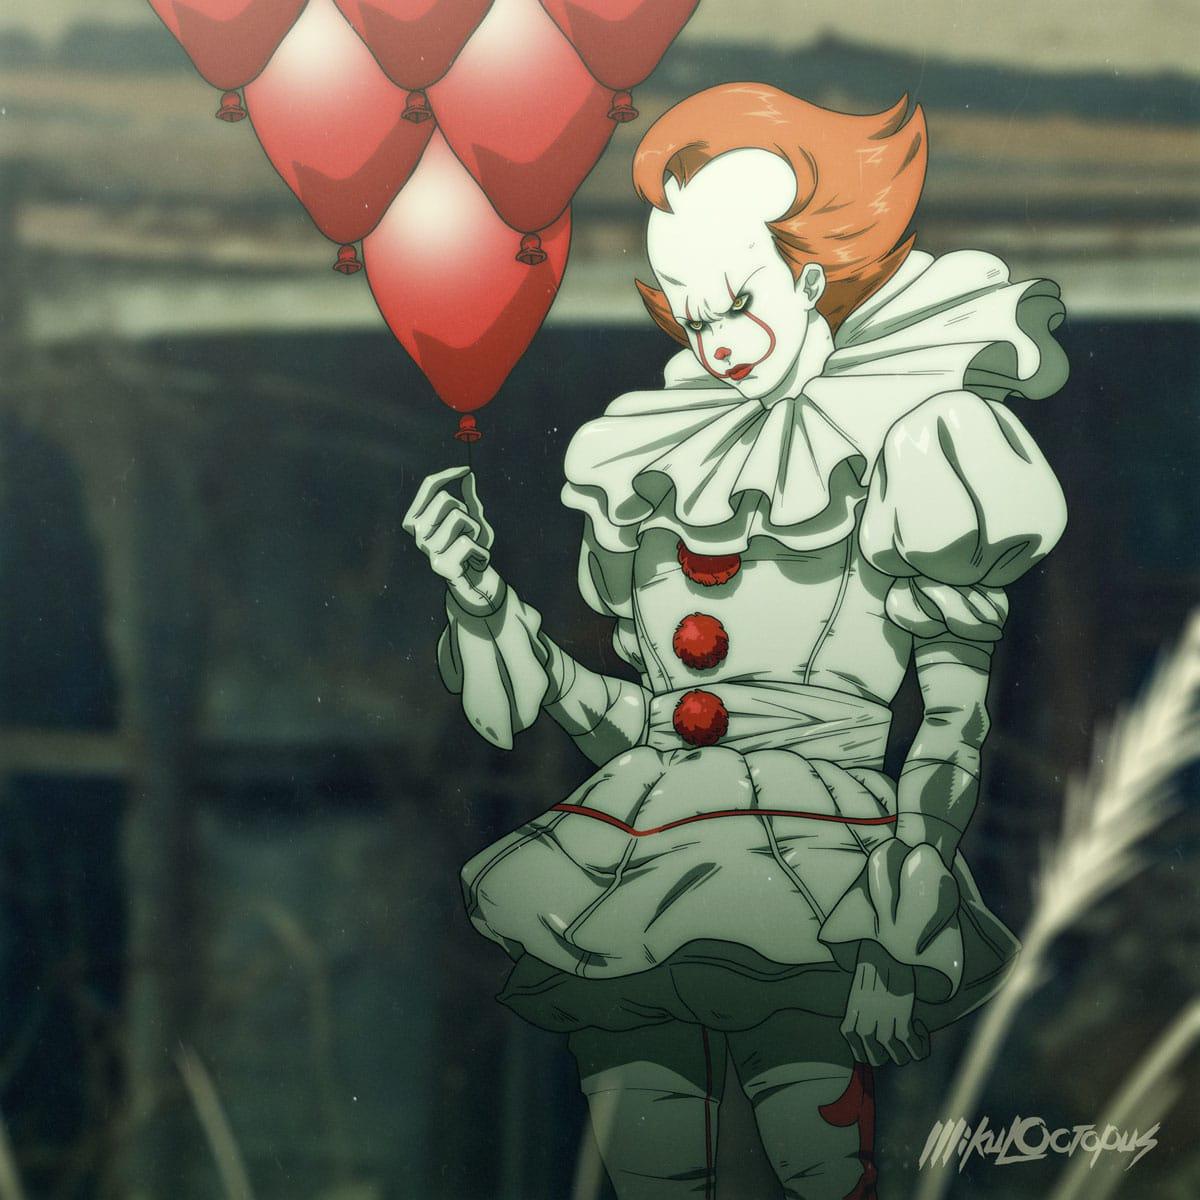 Artista imagina como it a coisa seria se fosse um anime jovem nerd mike anderson it anime 1 stopboris Gallery